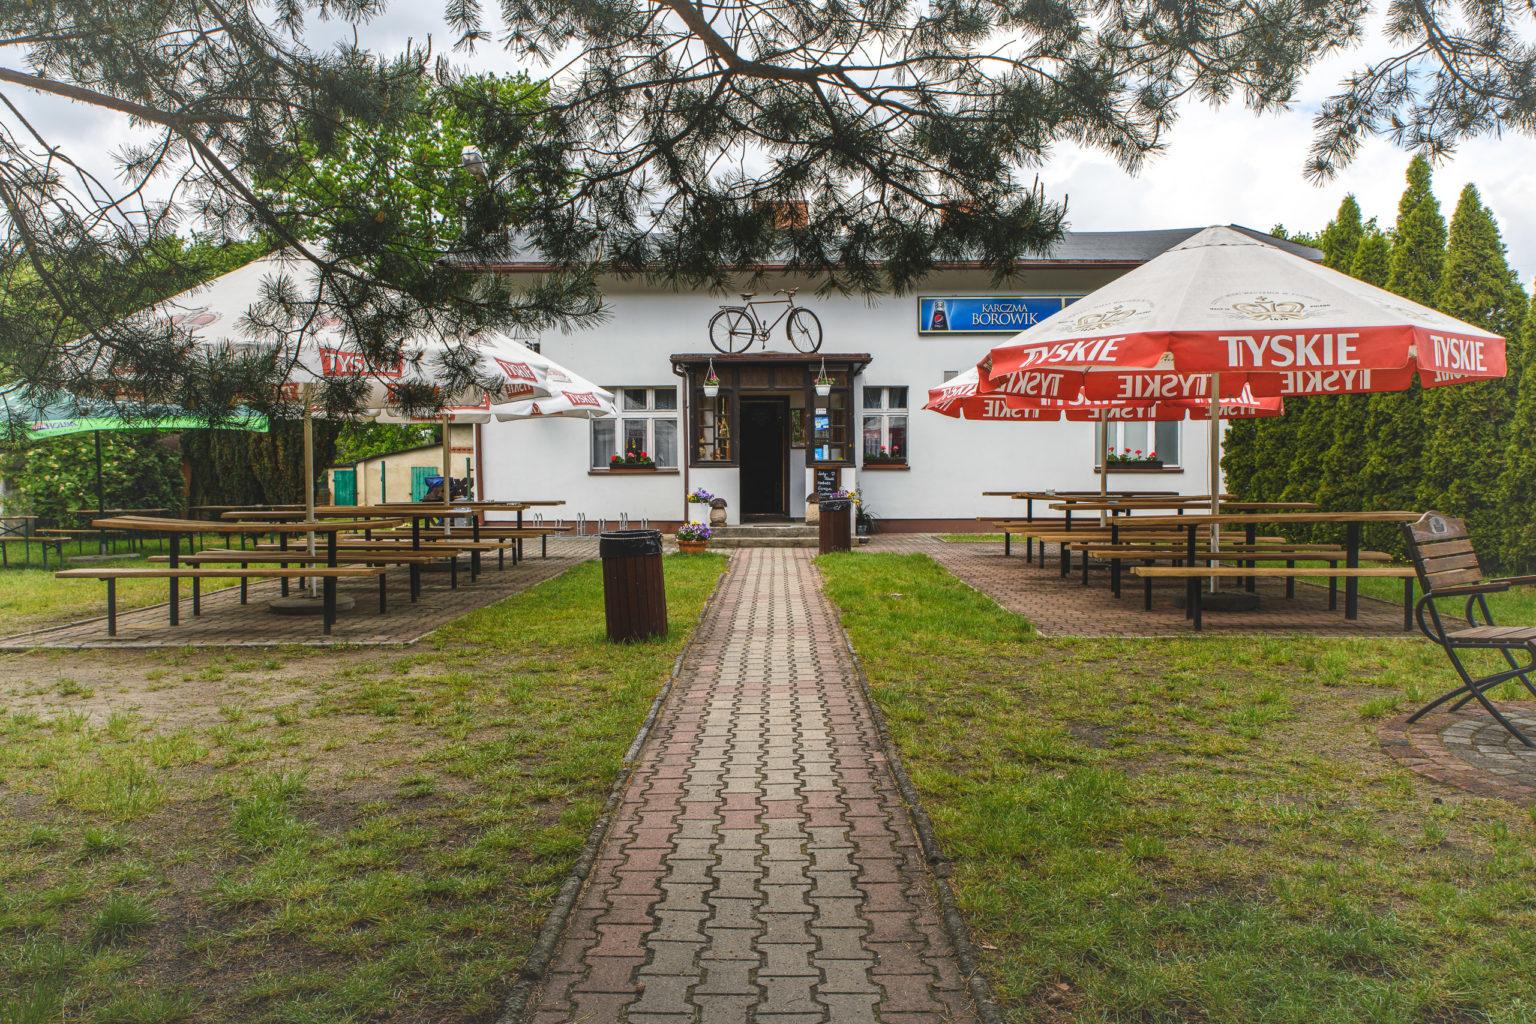 Bar Borowik